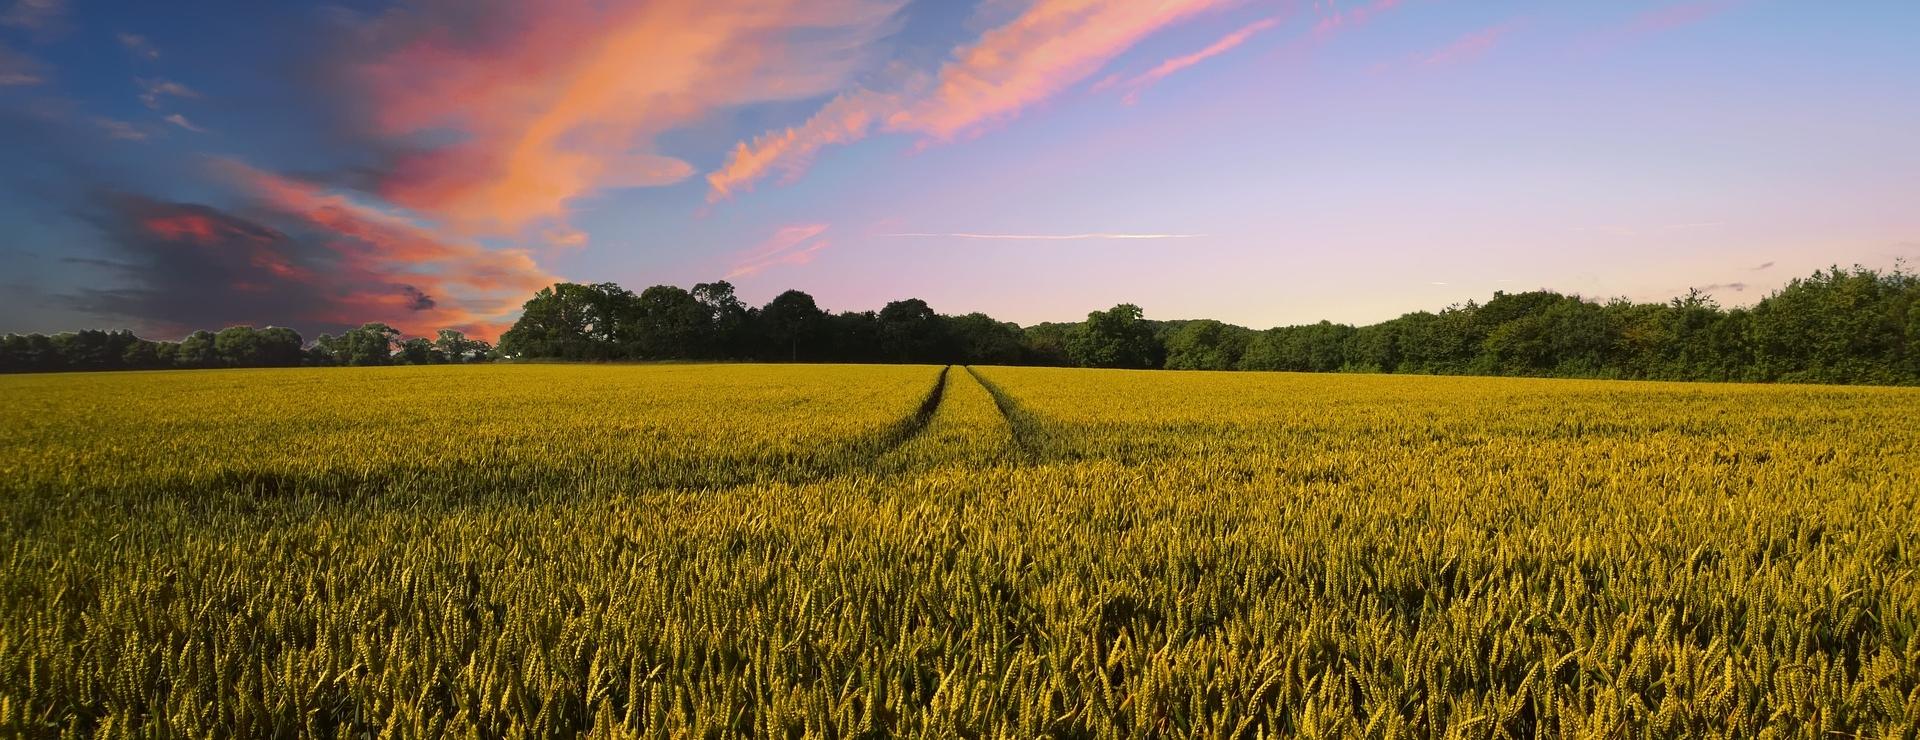 Countryside field trips